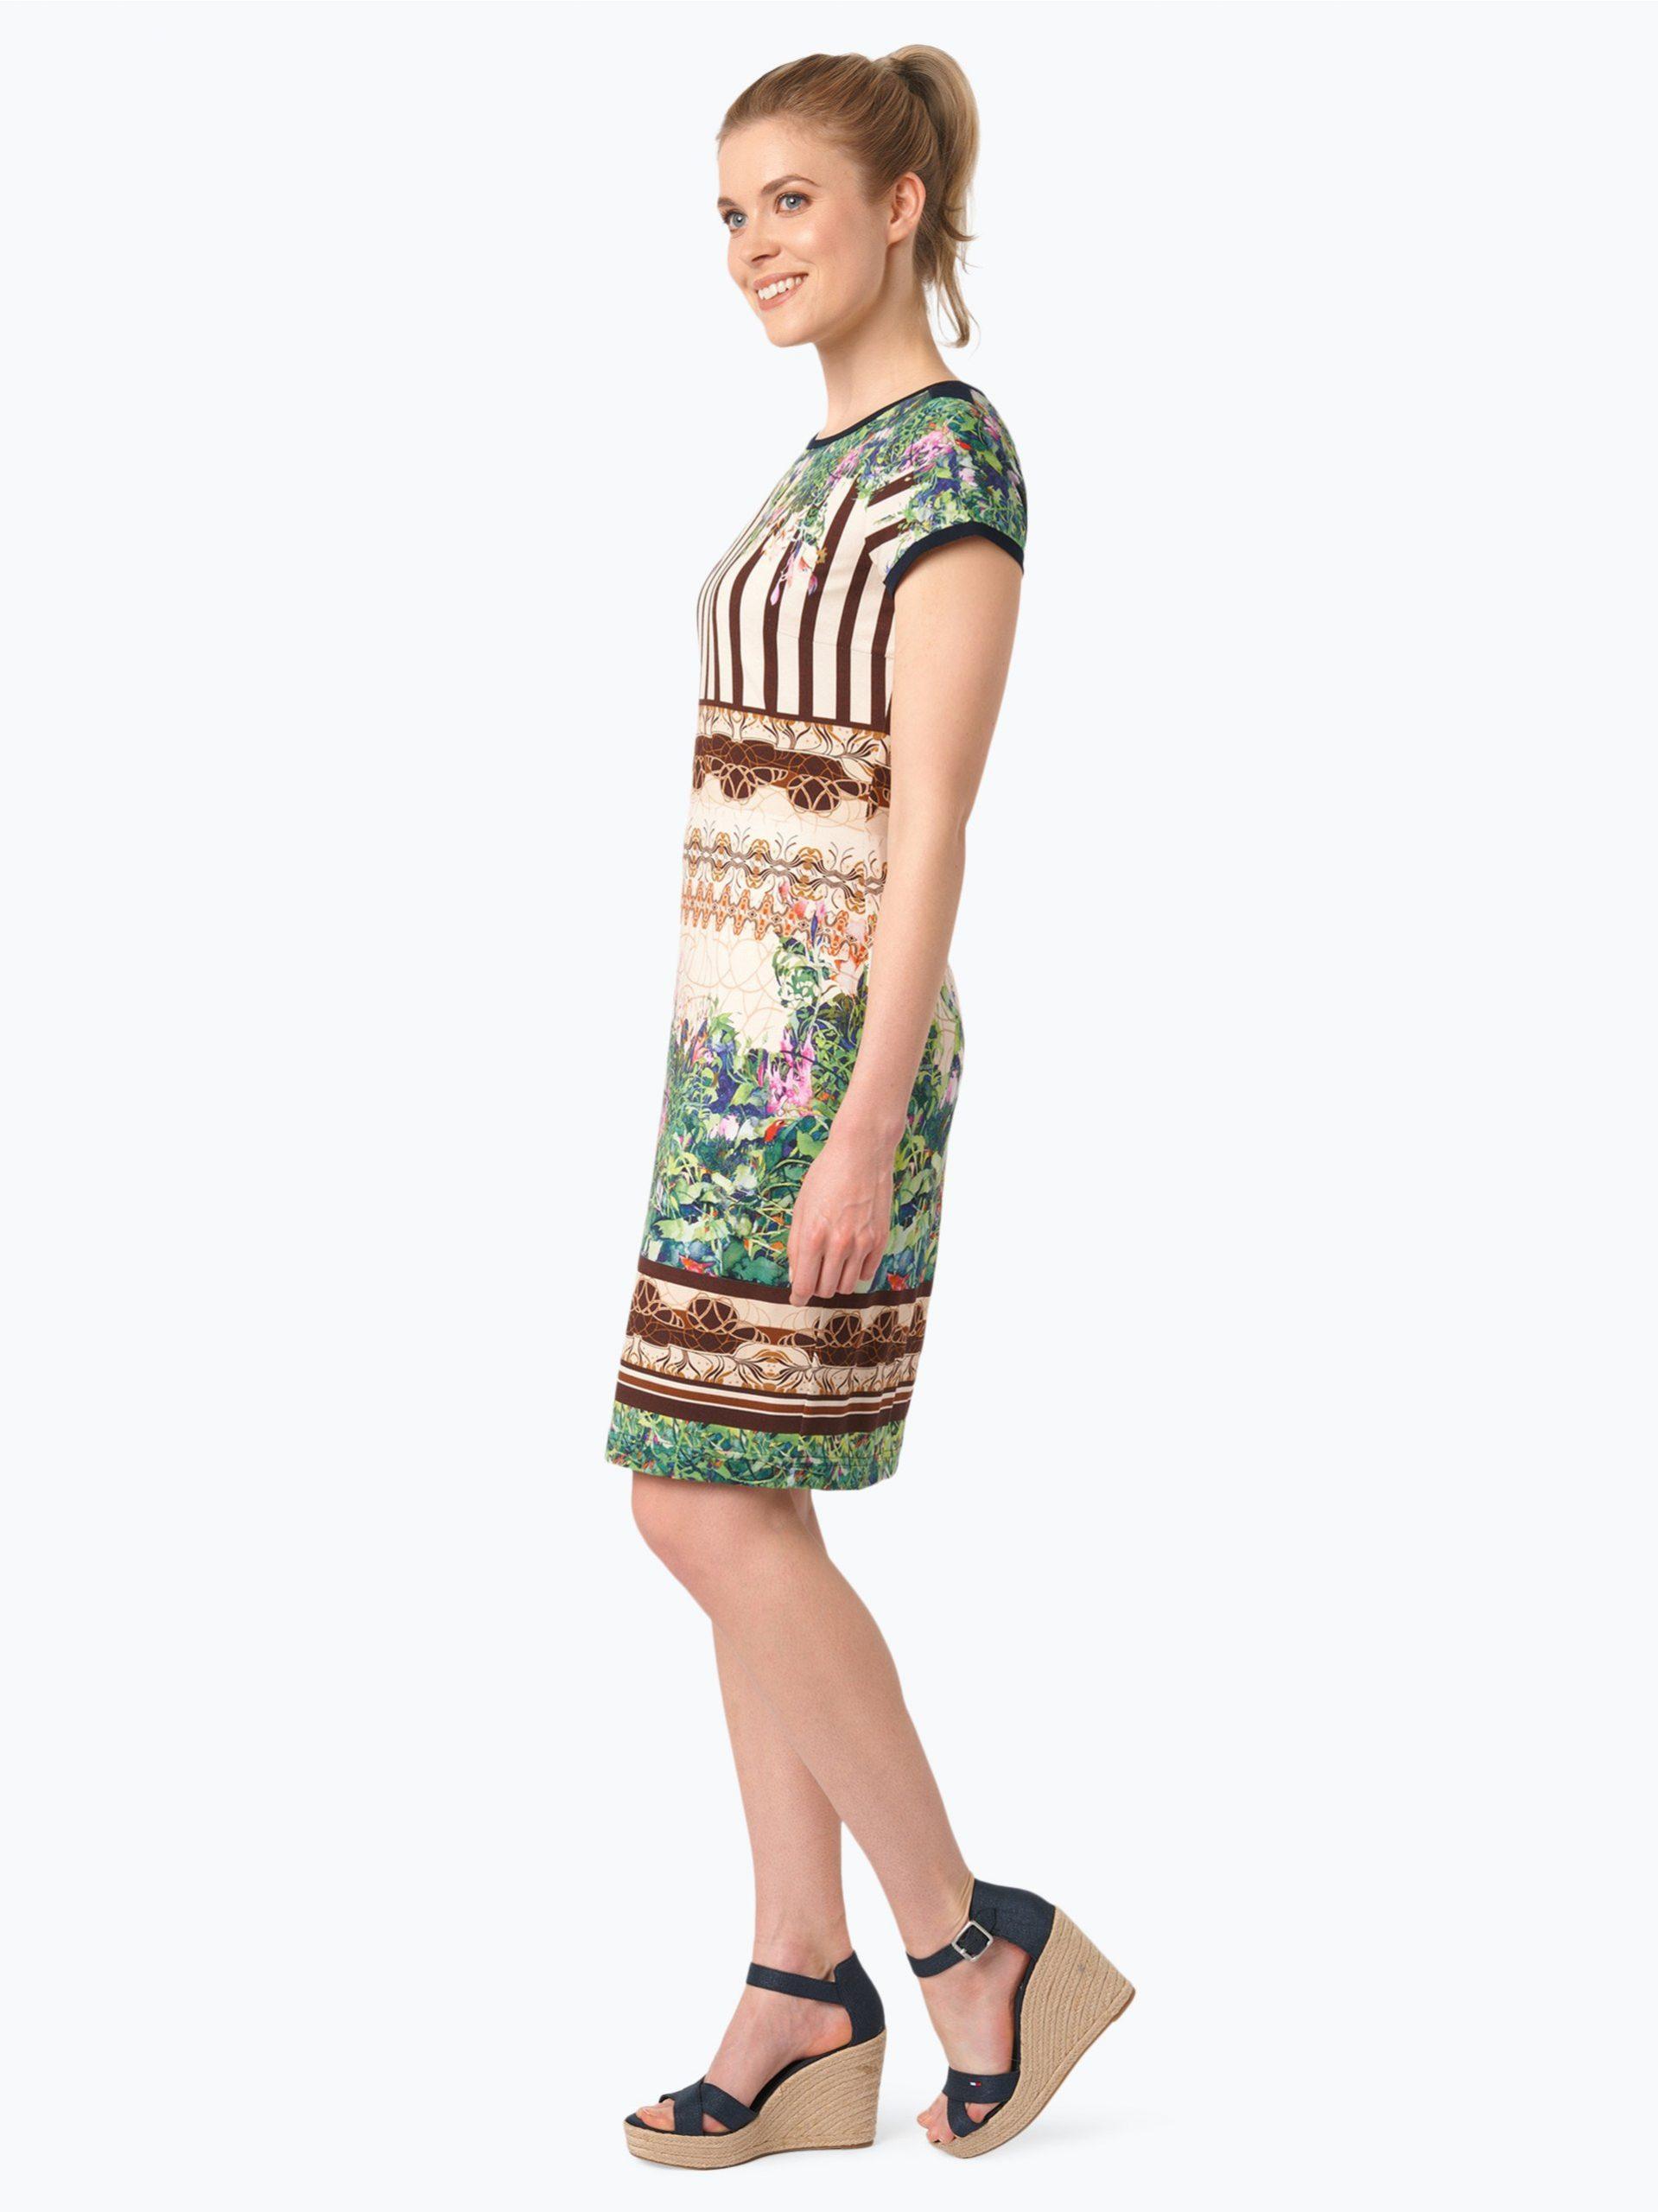 Apanage Damen Kleid Online Kaufen  Peekundcloppenburgde